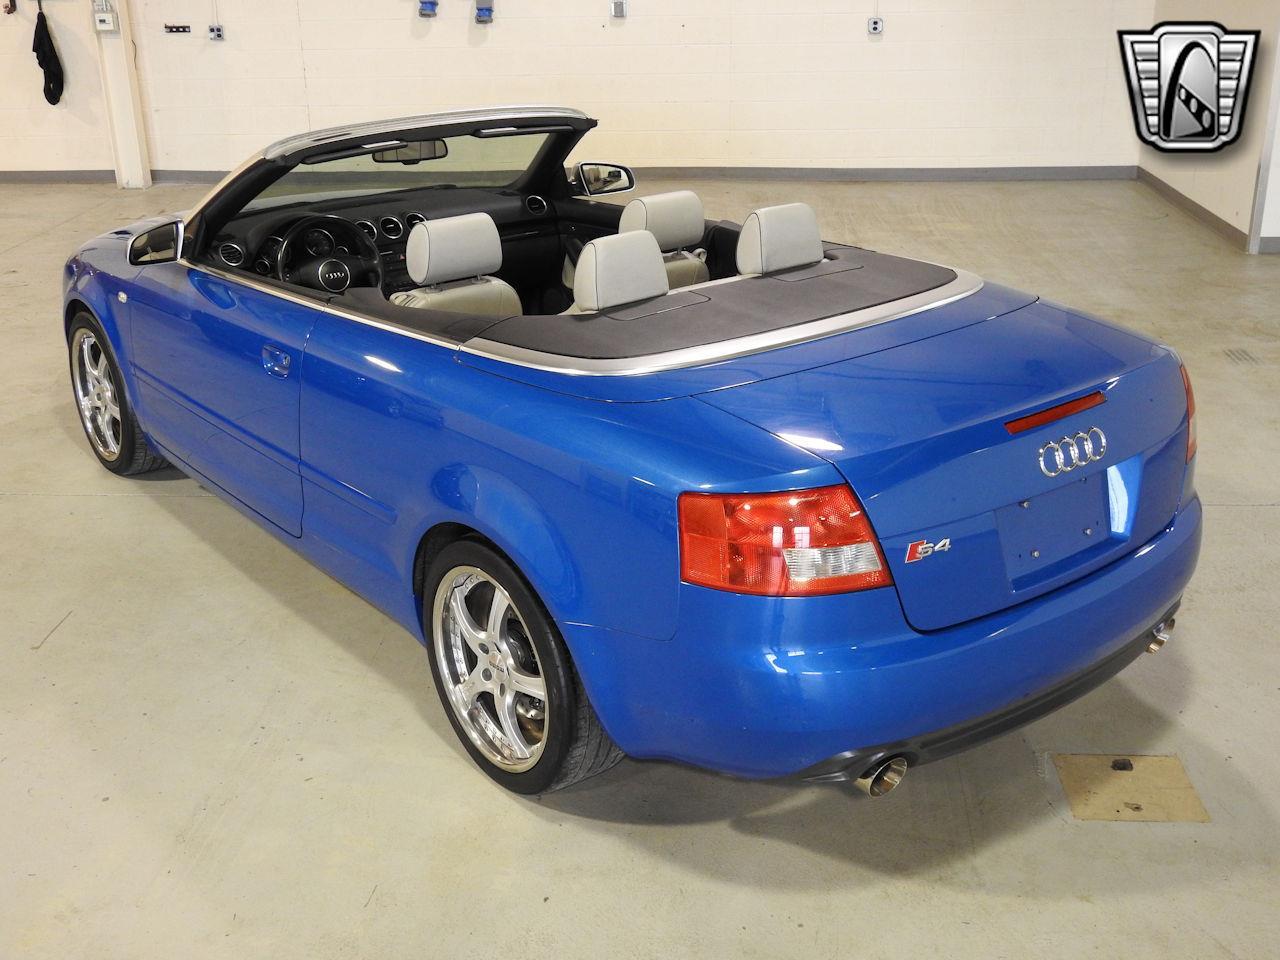 2004 Audi S4 (CC-1341188) for sale in O'Fallon, Illinois